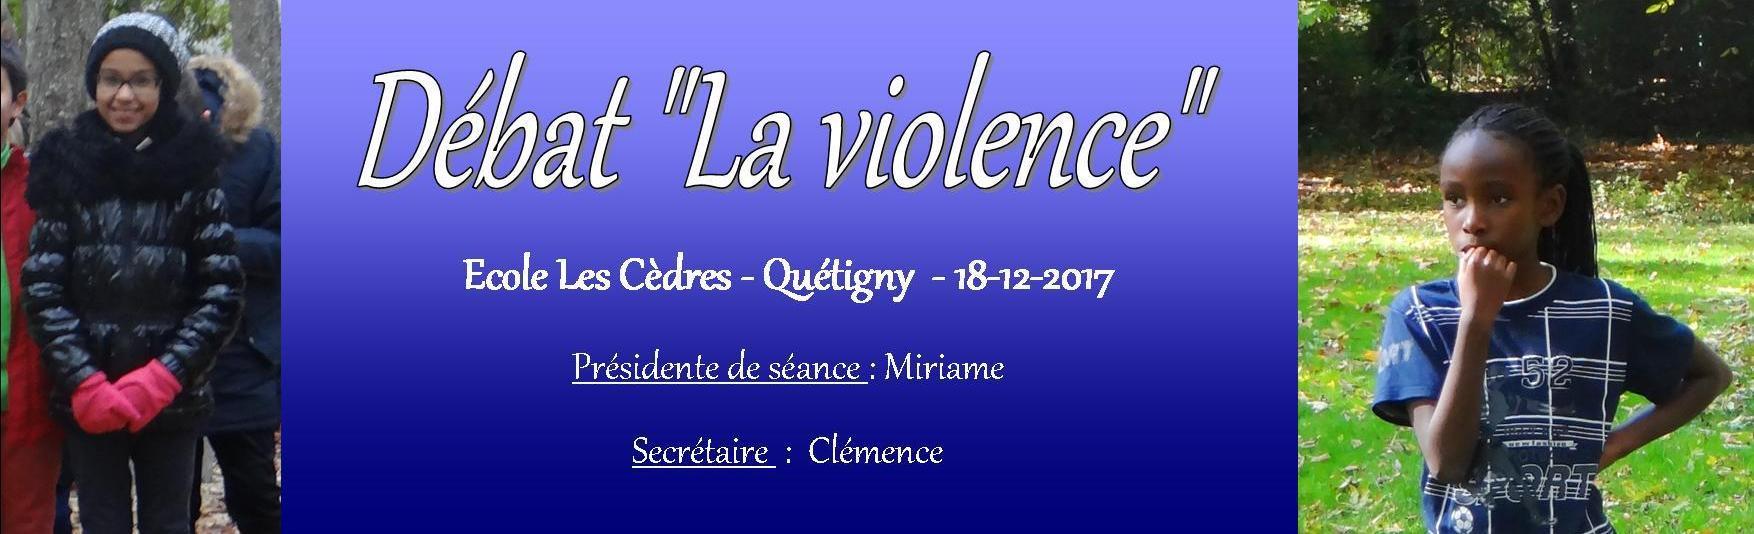 Débat - La violence.jpg